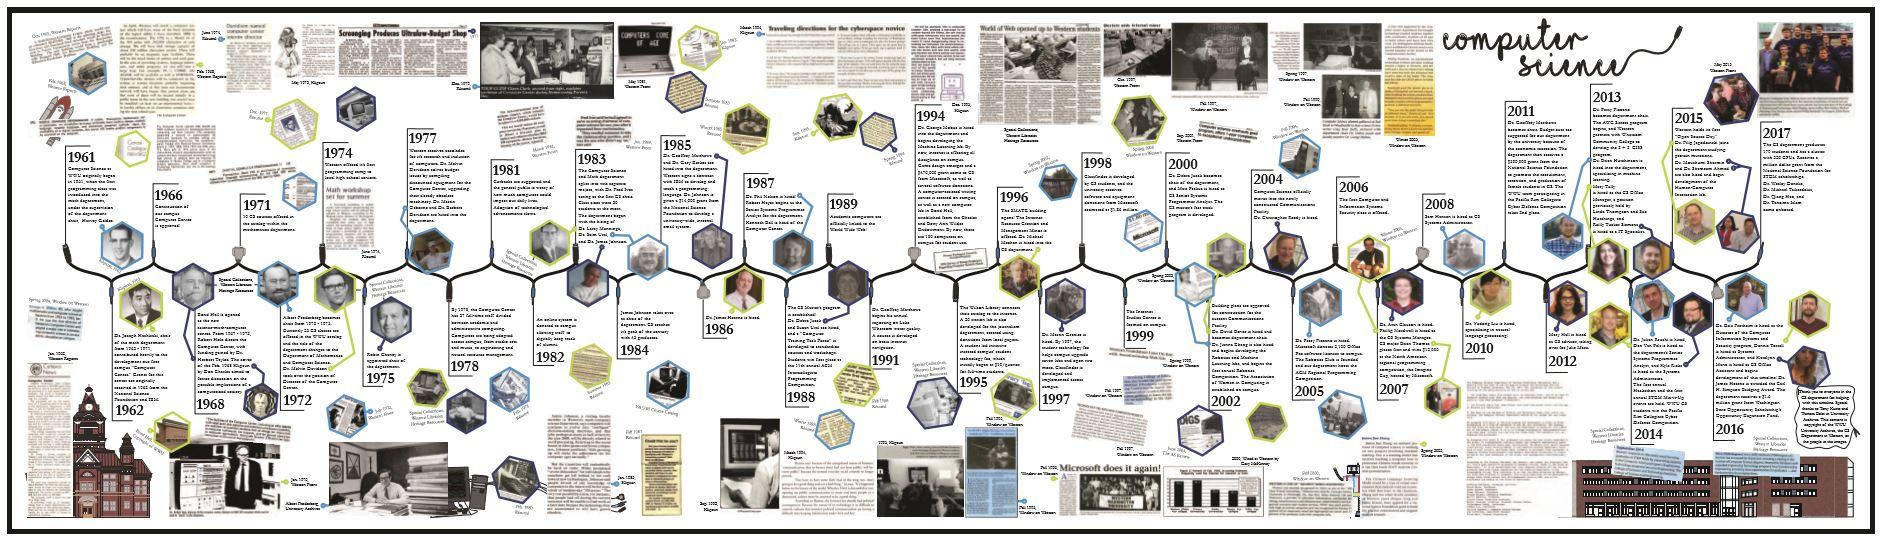 Timeline of Computing at Western